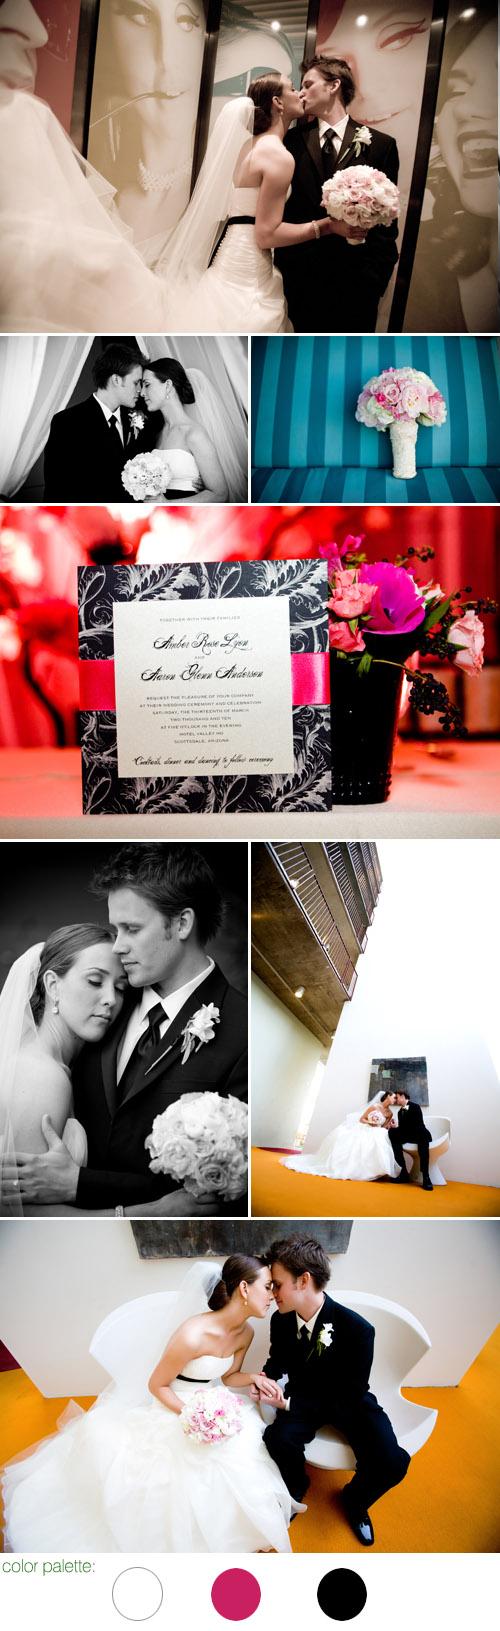 Scottsdale, Arizona Hotel Valley Ho real wedding photos by Kimberly Jarman